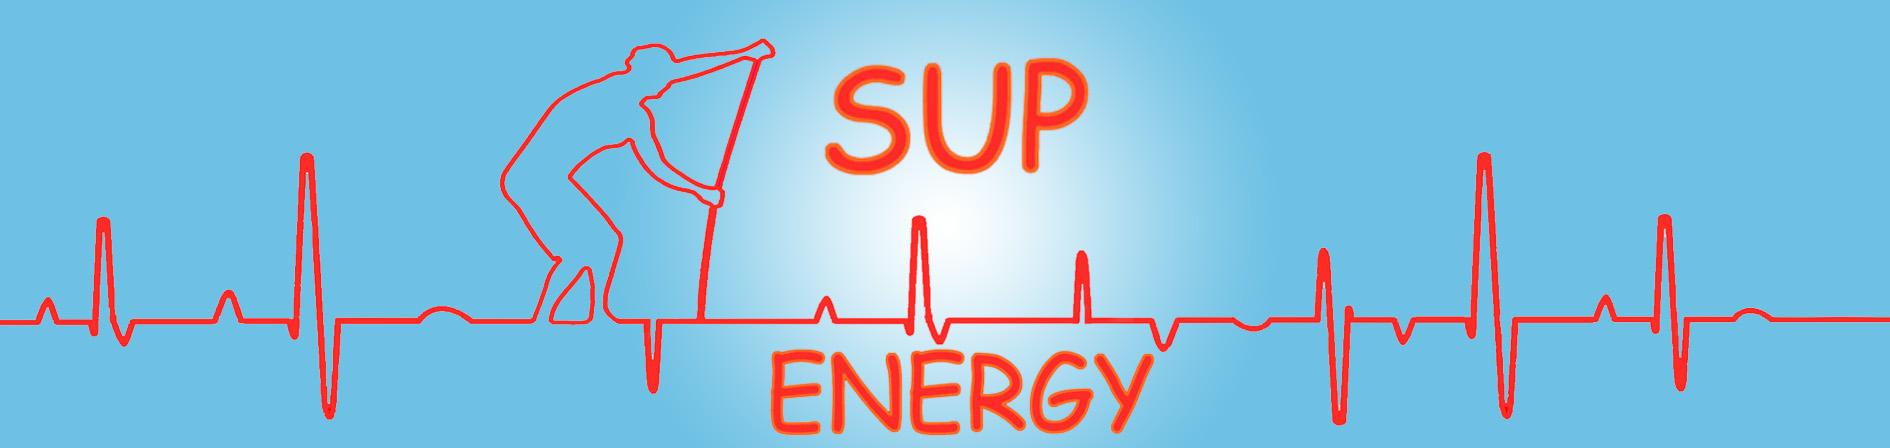 sup-energy